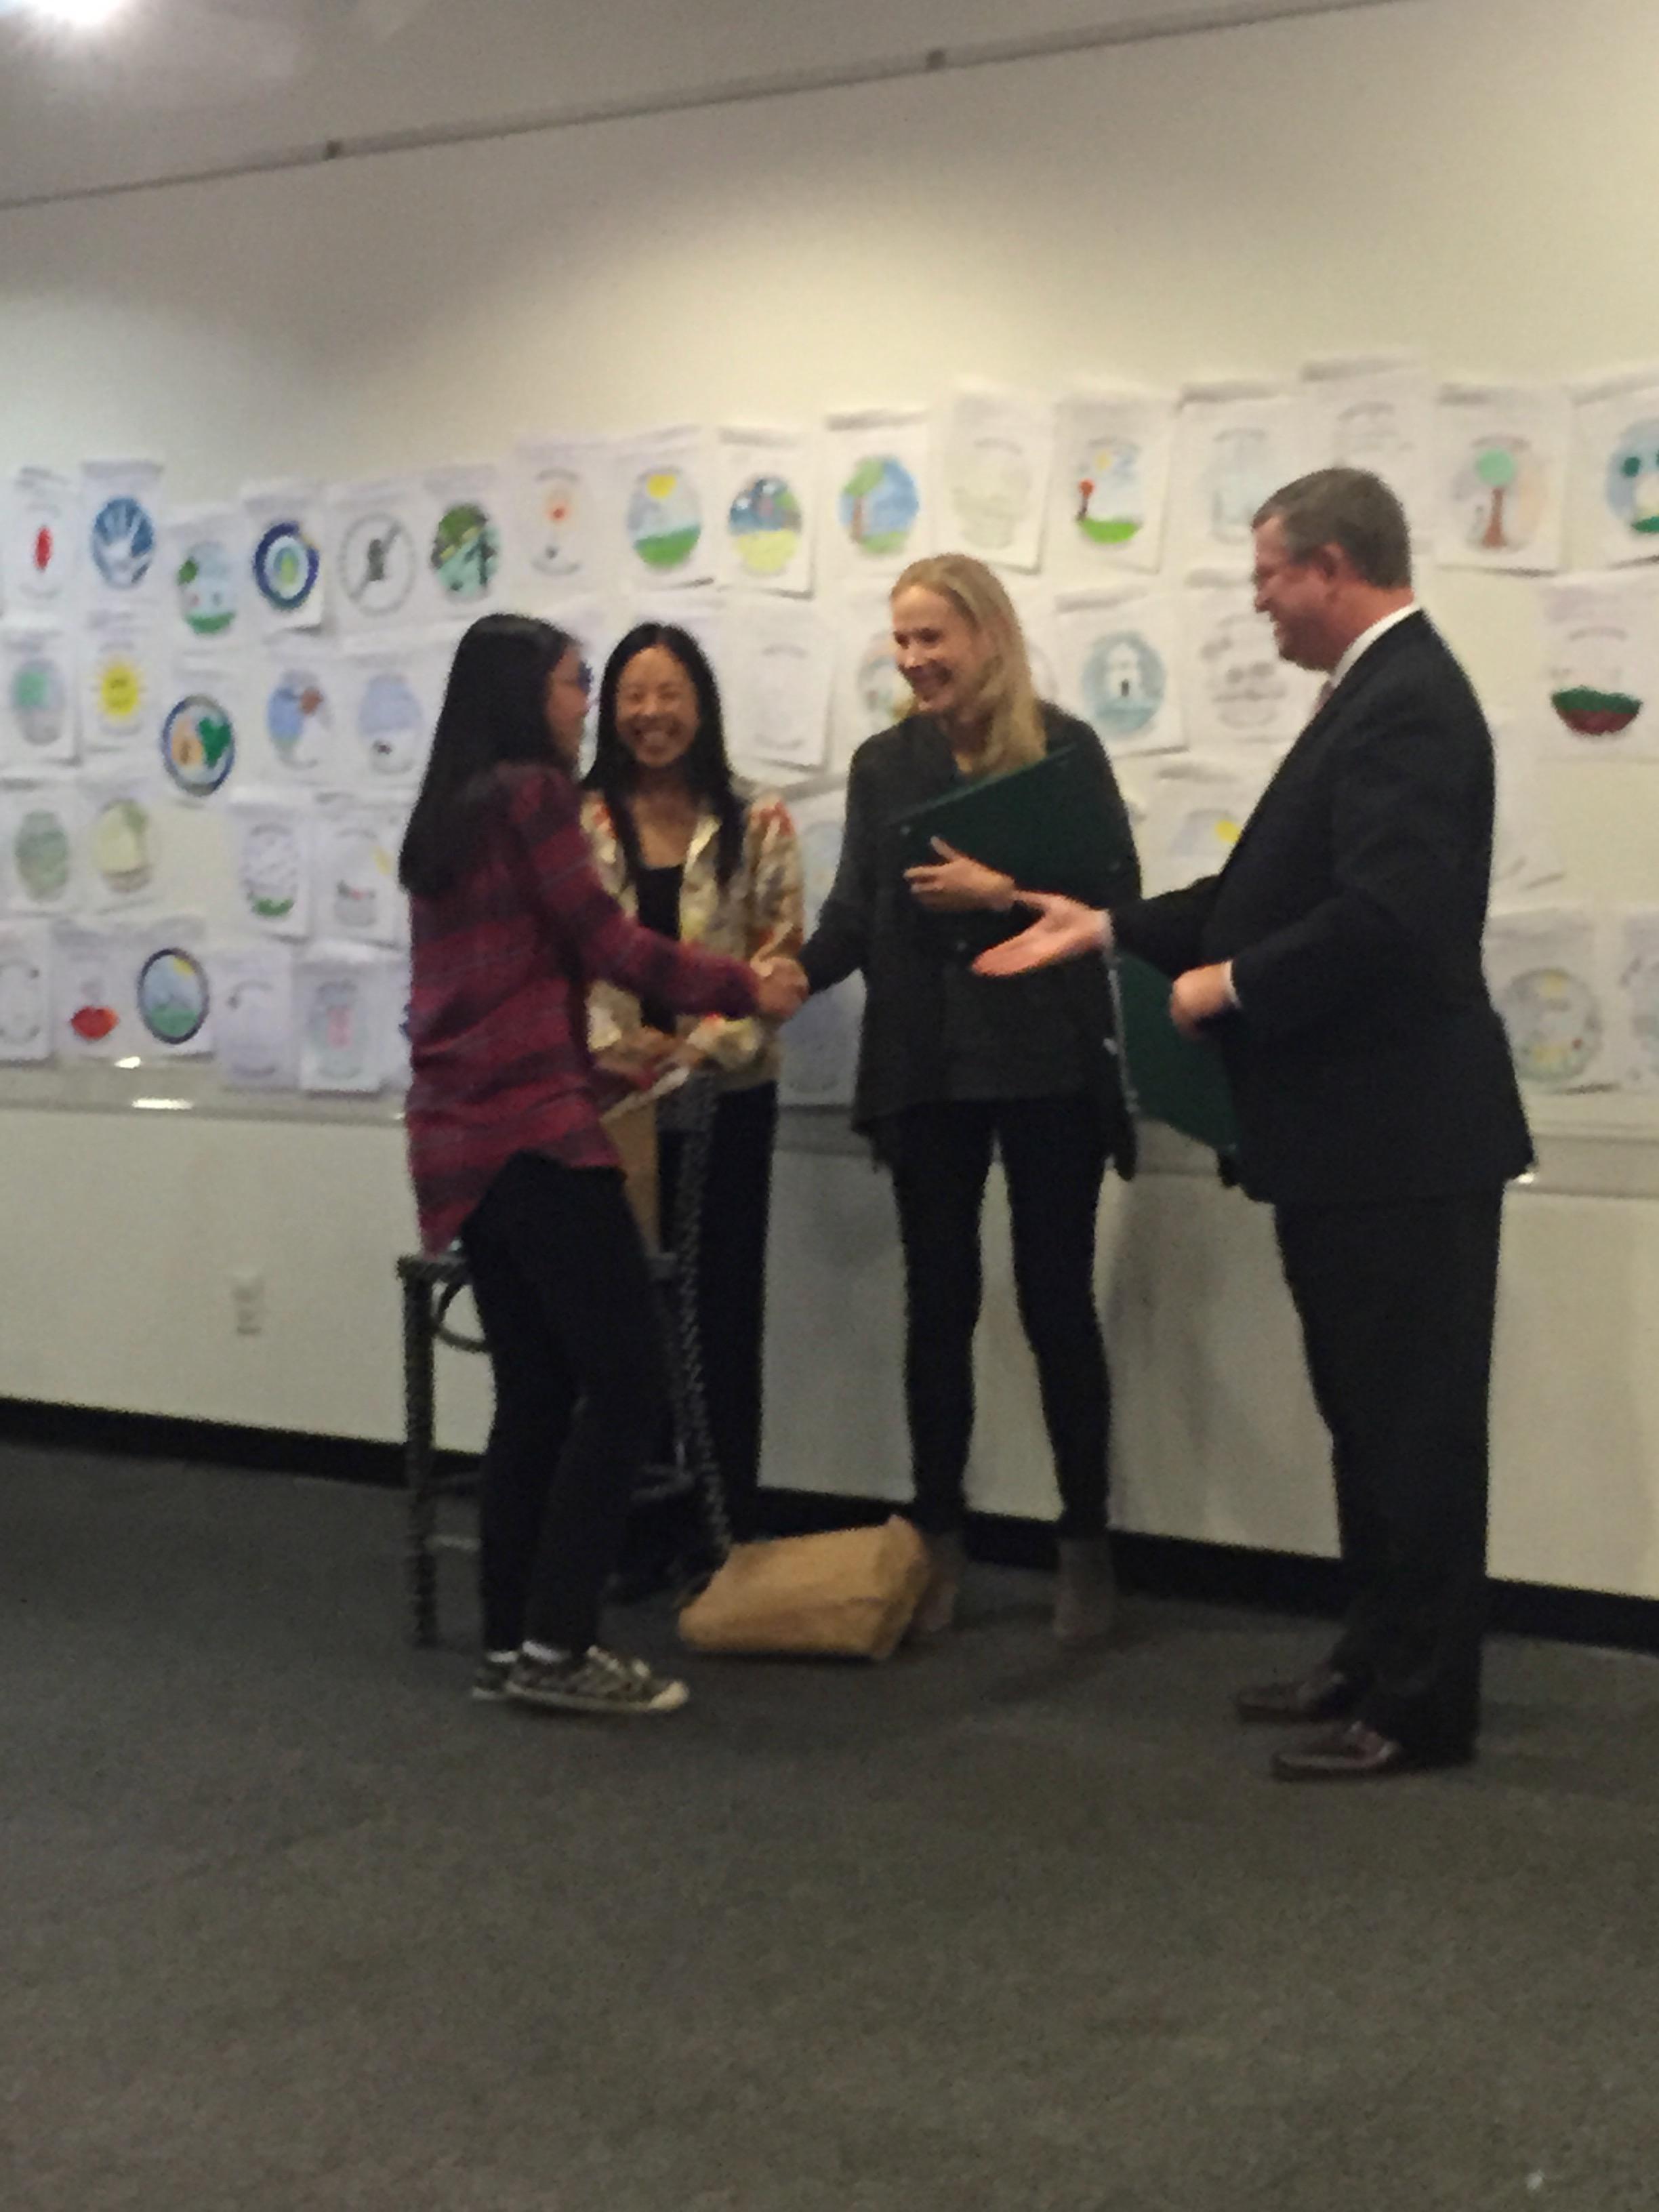 Charlotte Lee receives her award